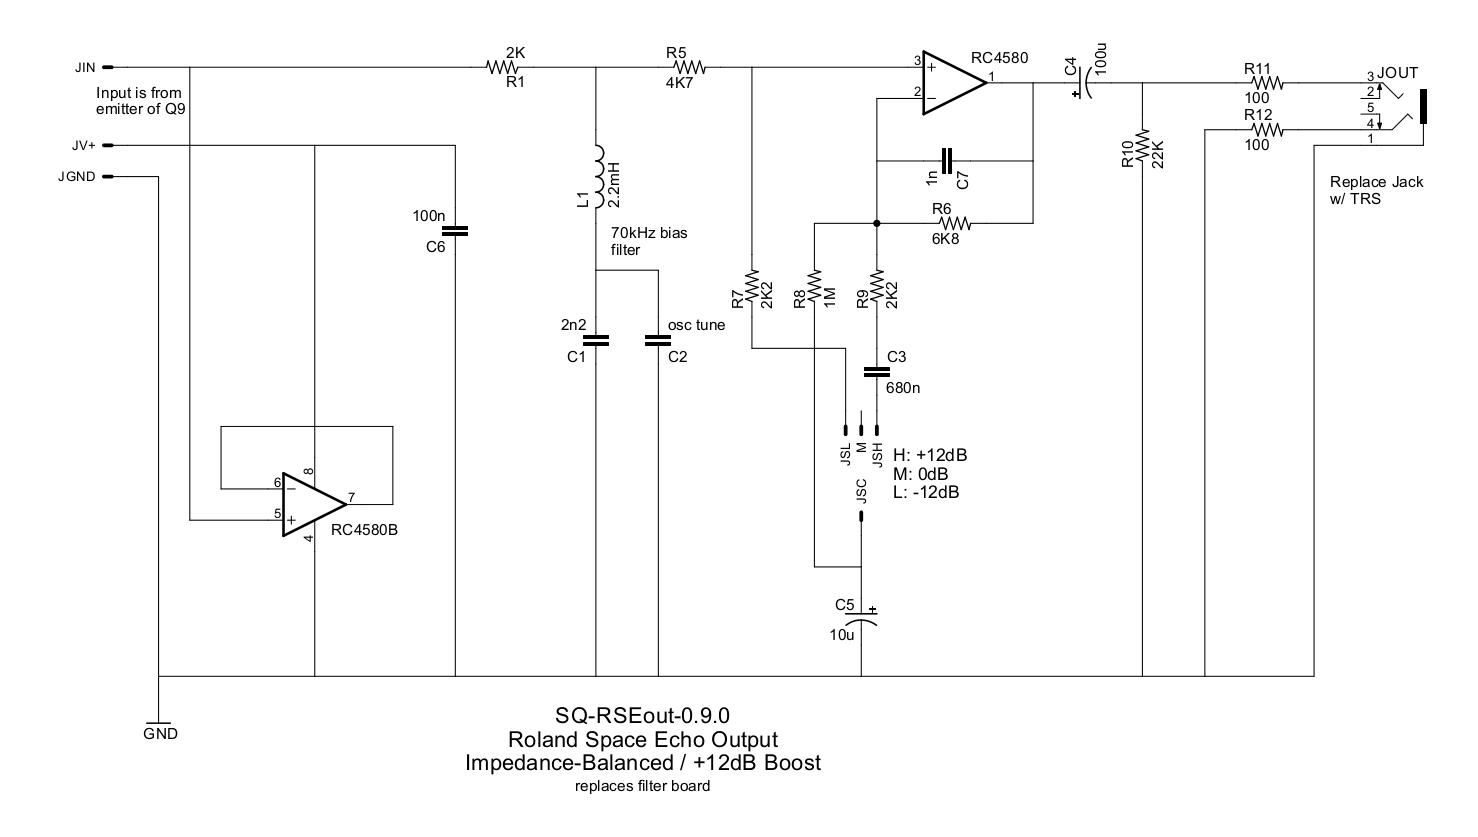 SQ-RSEout-0.9.0schem.png